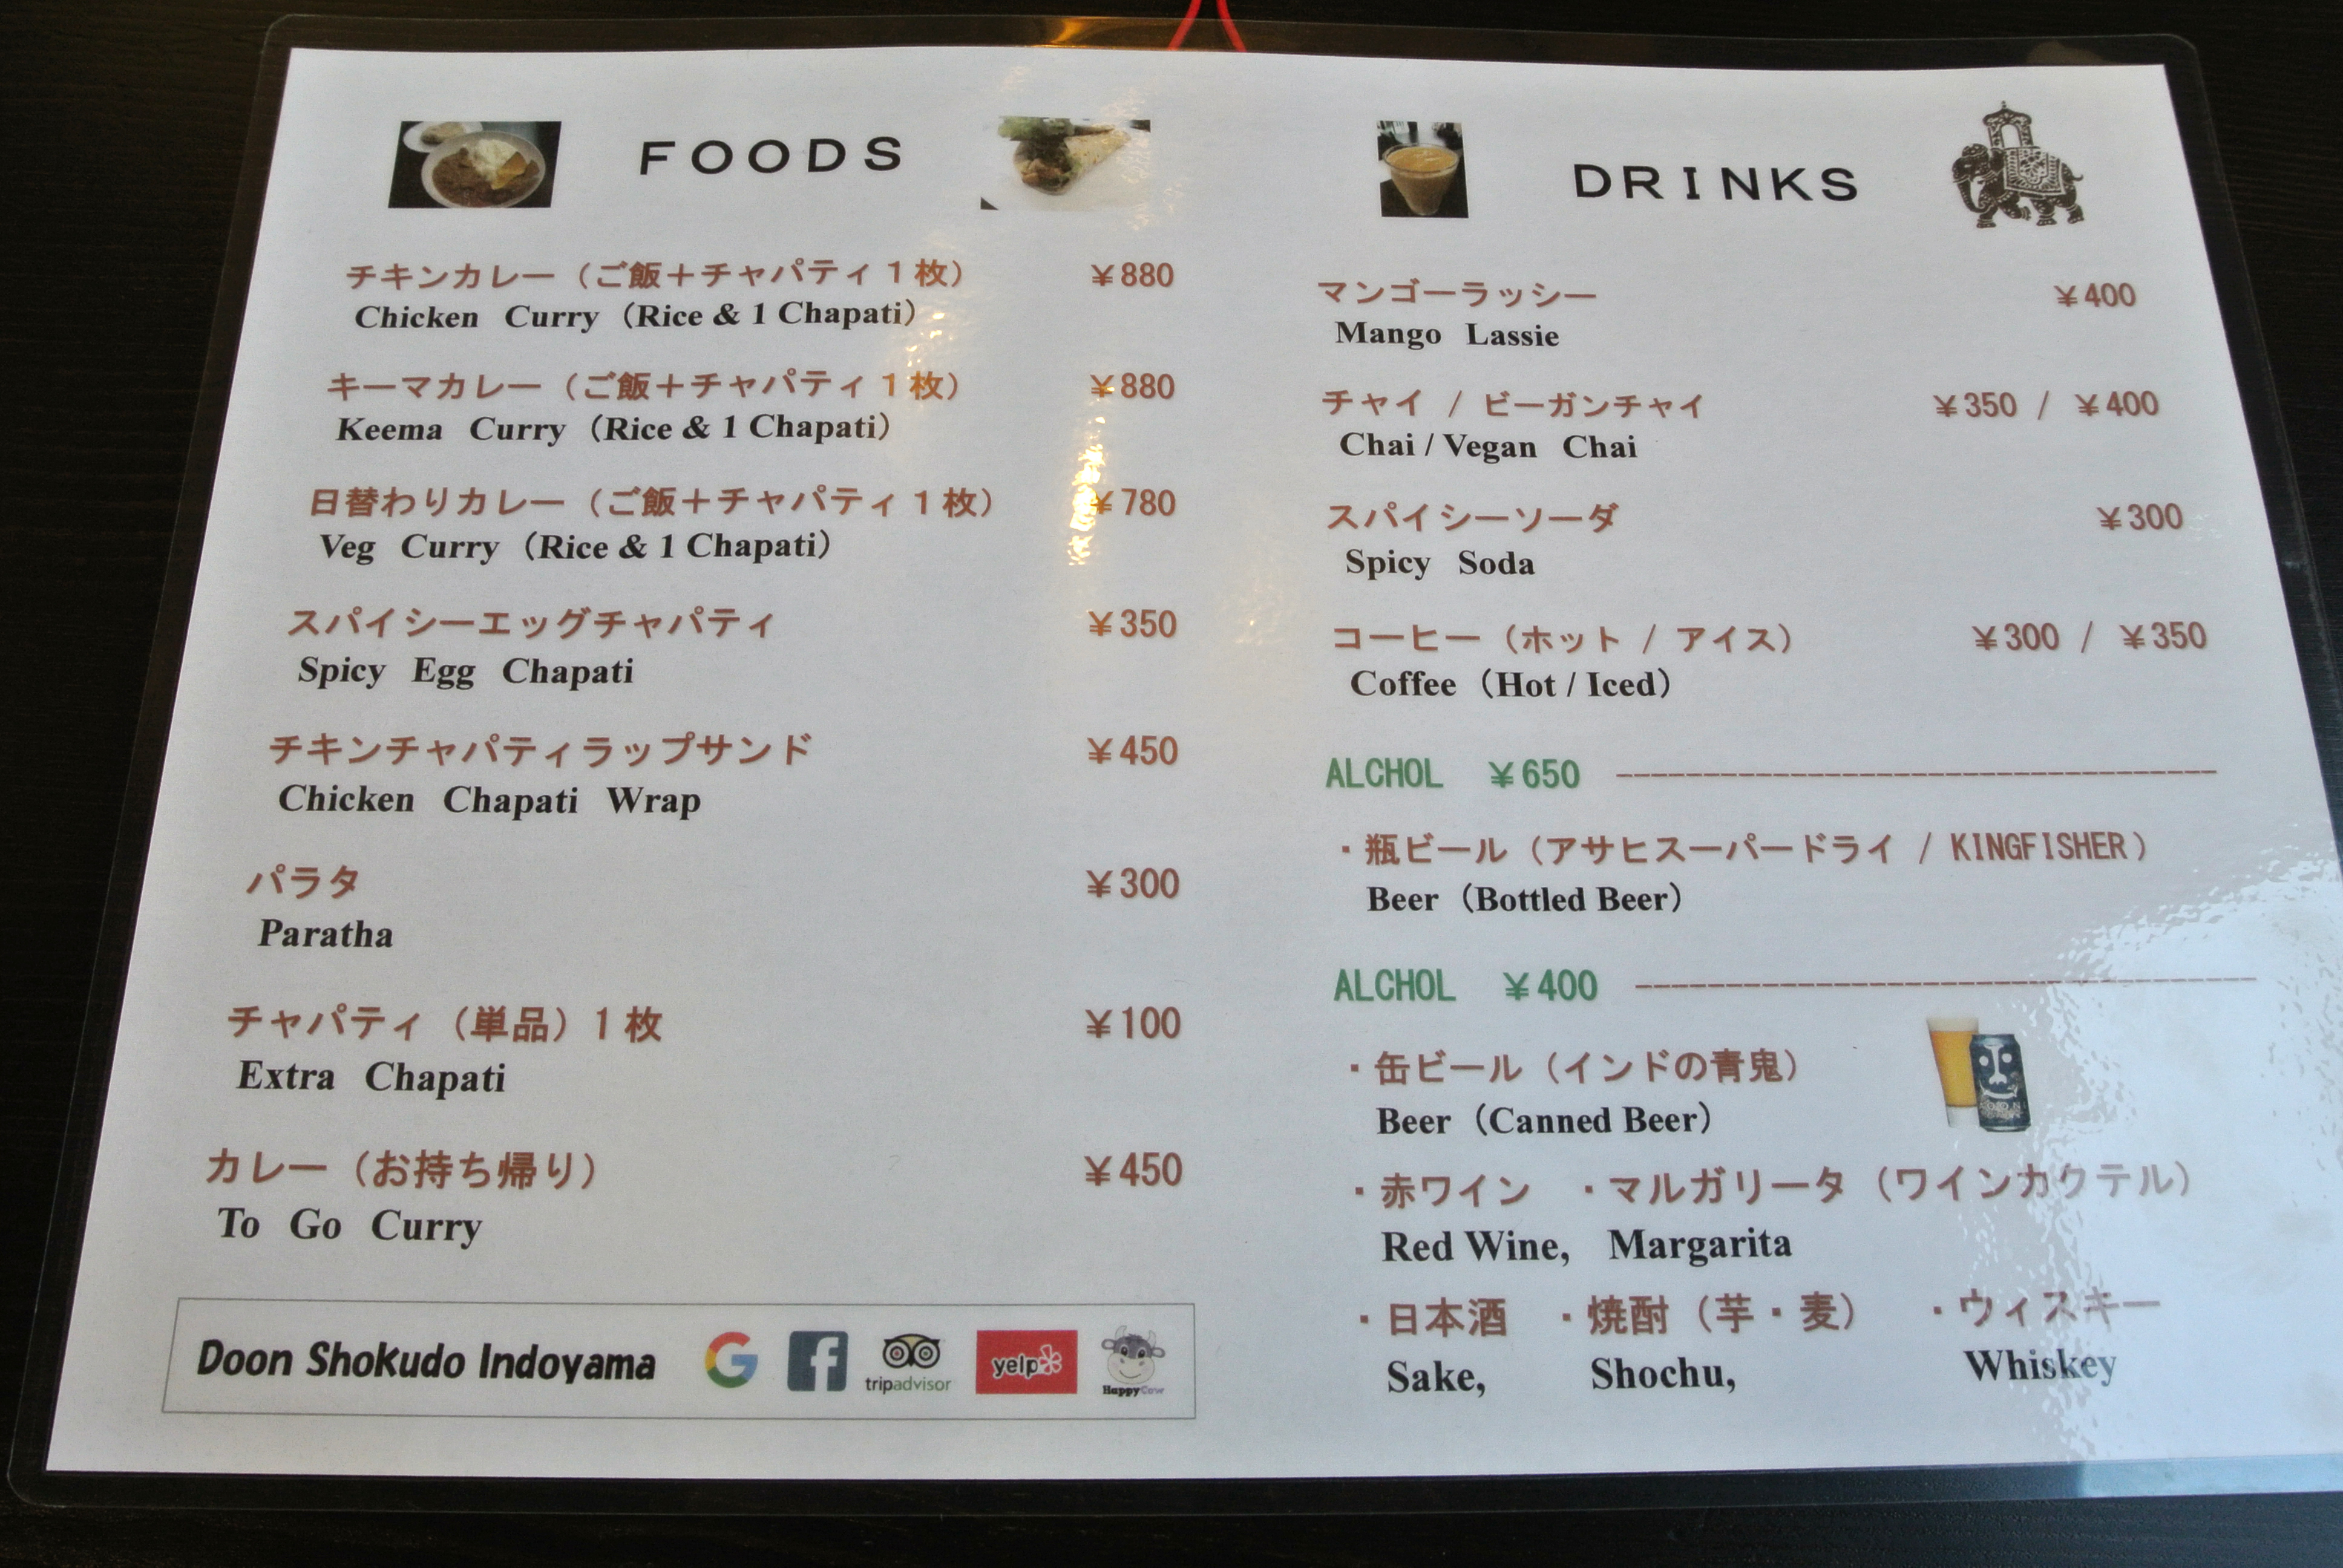 Doon食堂インド山のメニュー